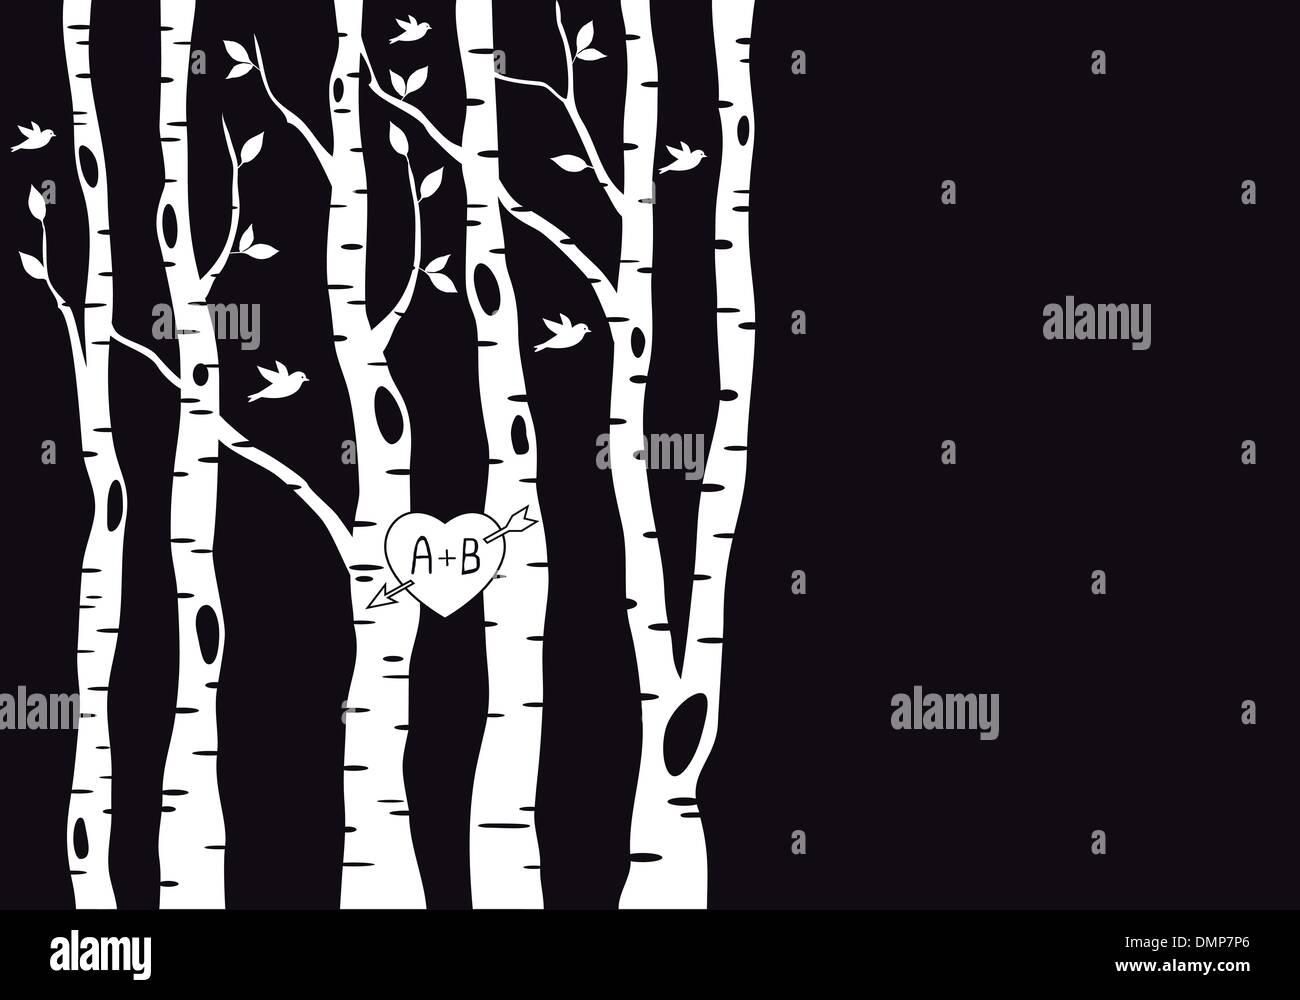 wedding invitation with birch trees, vector - Stock Image